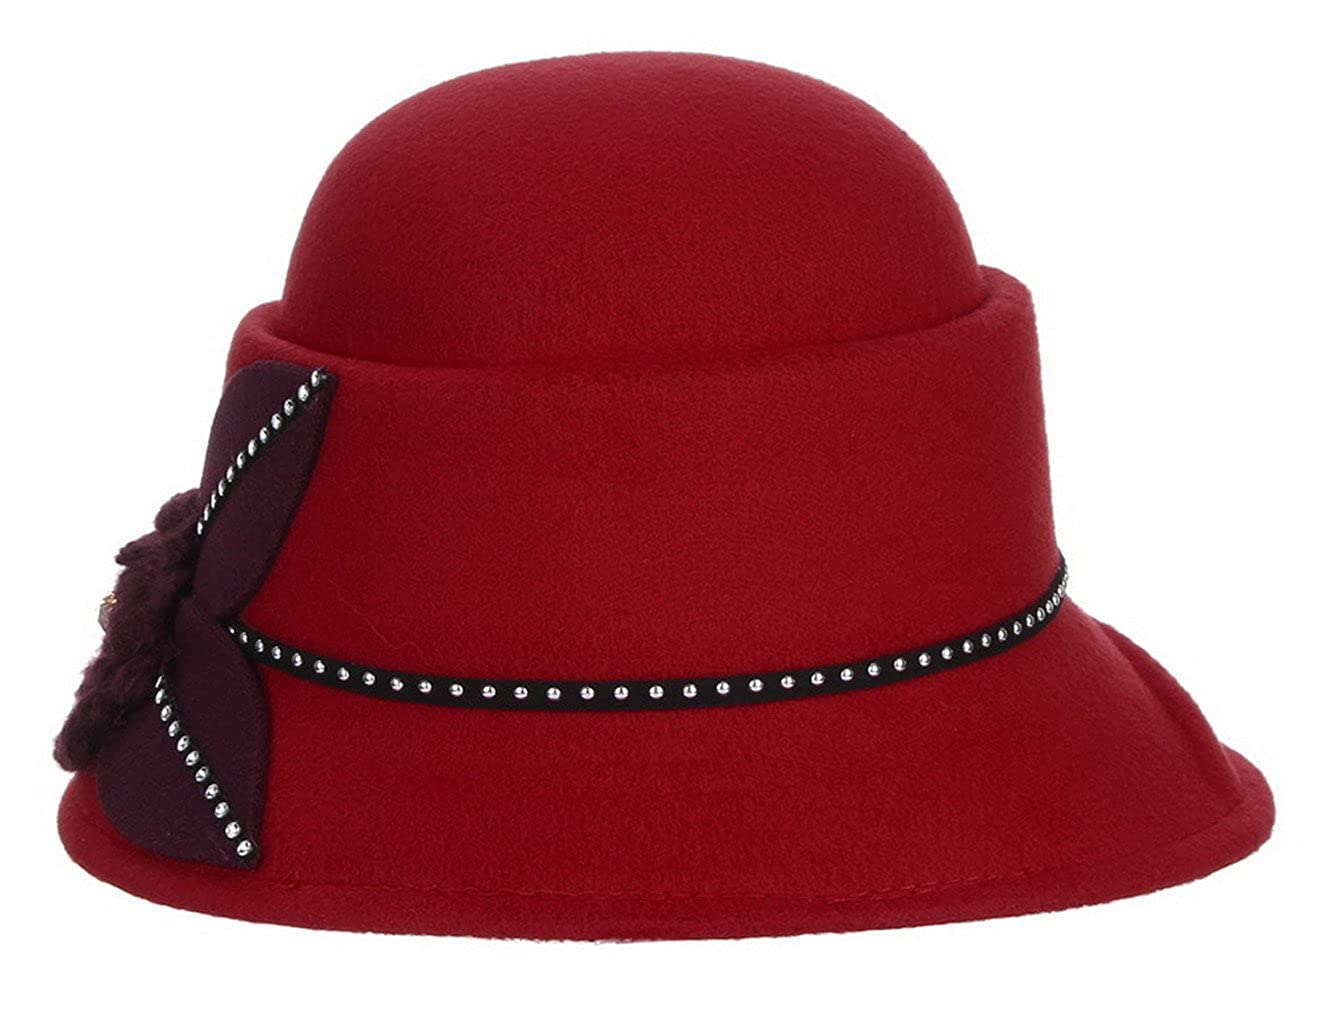 Lukis Women Flower Wool Felt Fedora Cloche Bucket Blower Cap